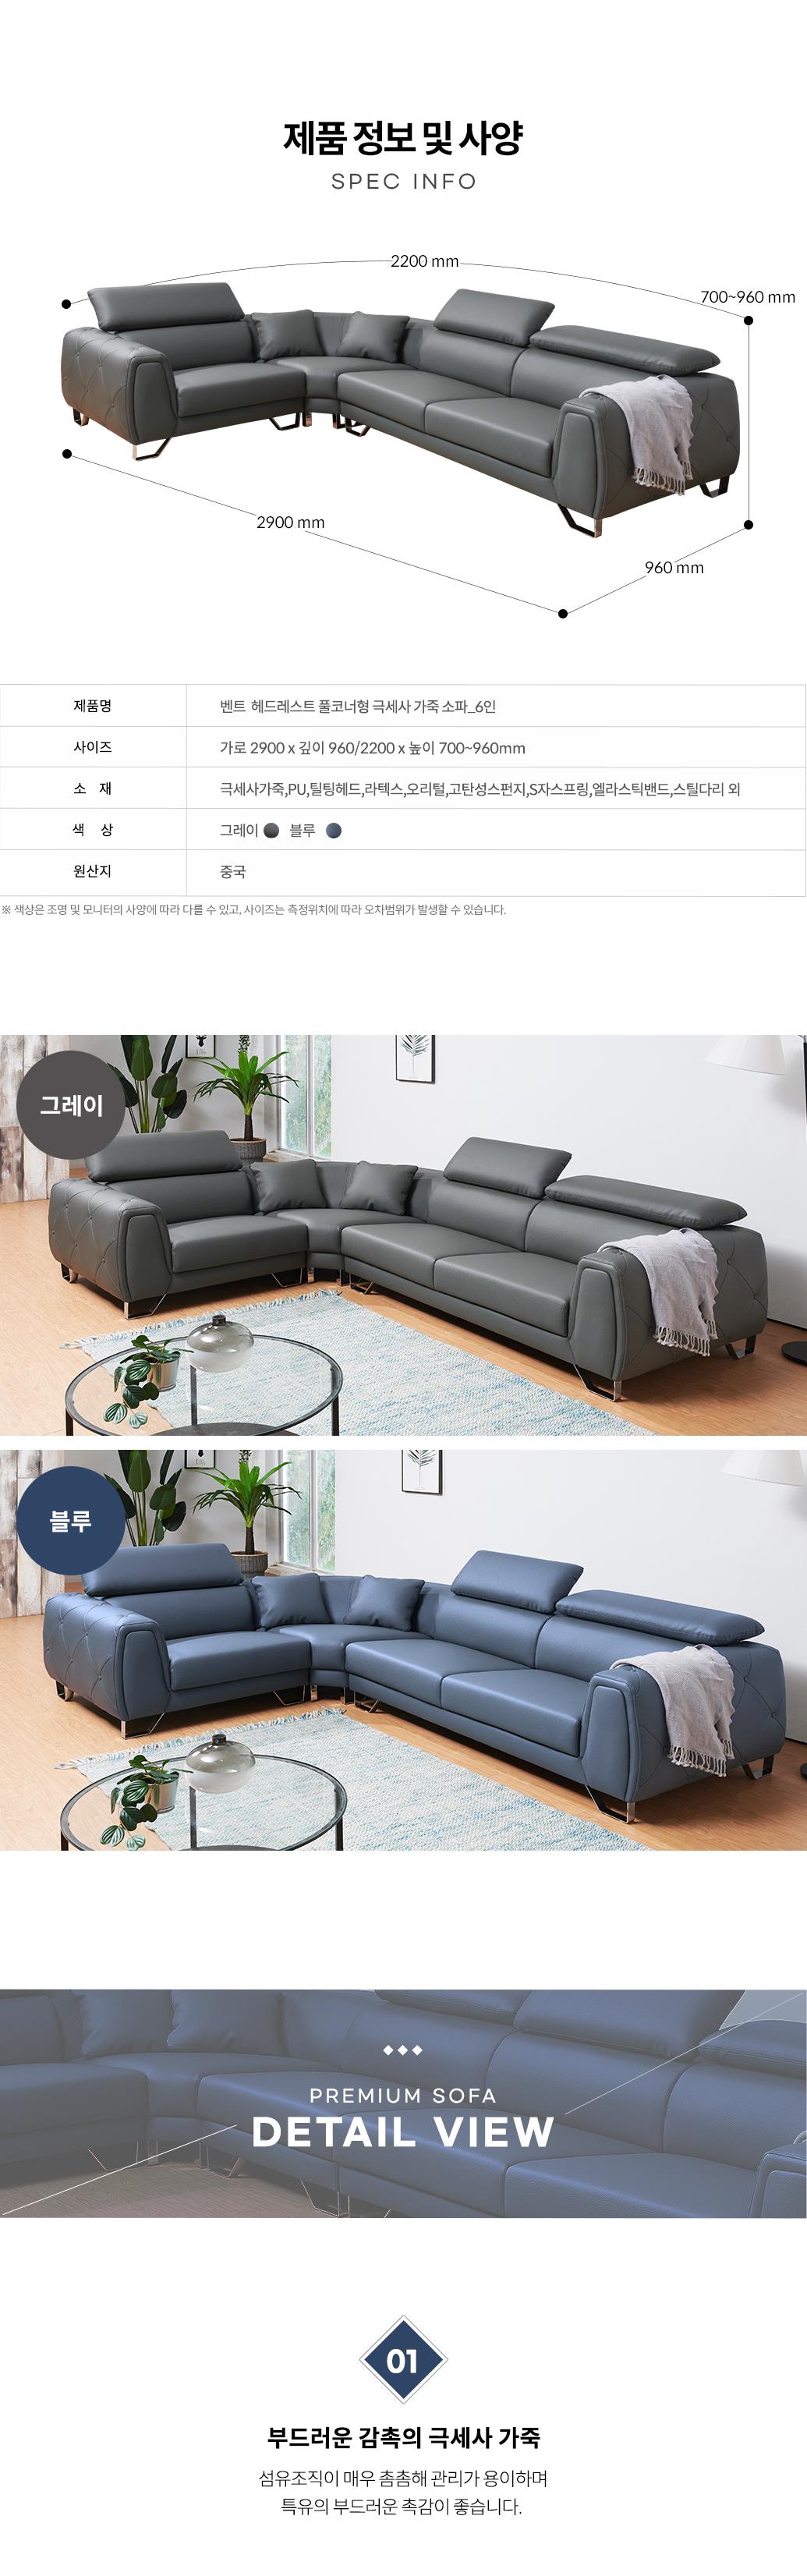 bent6_sofa_02.jpg